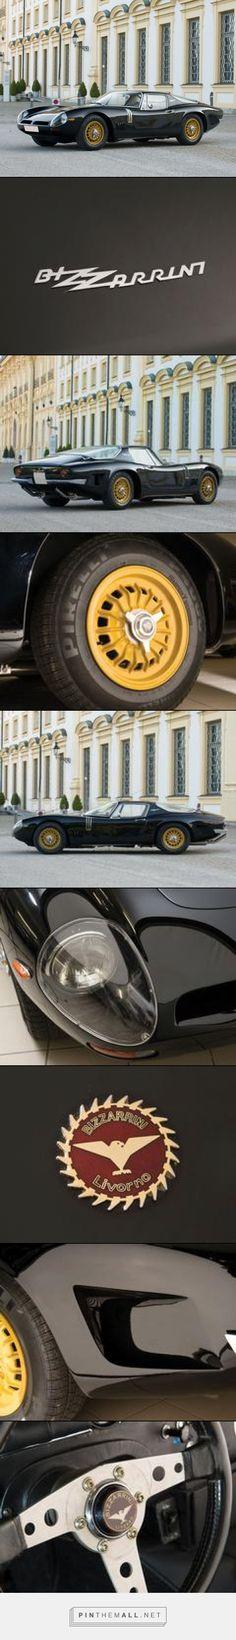 1966 Bizzarrini GT Strada 5300 | London 2015 | RM Sotheby's